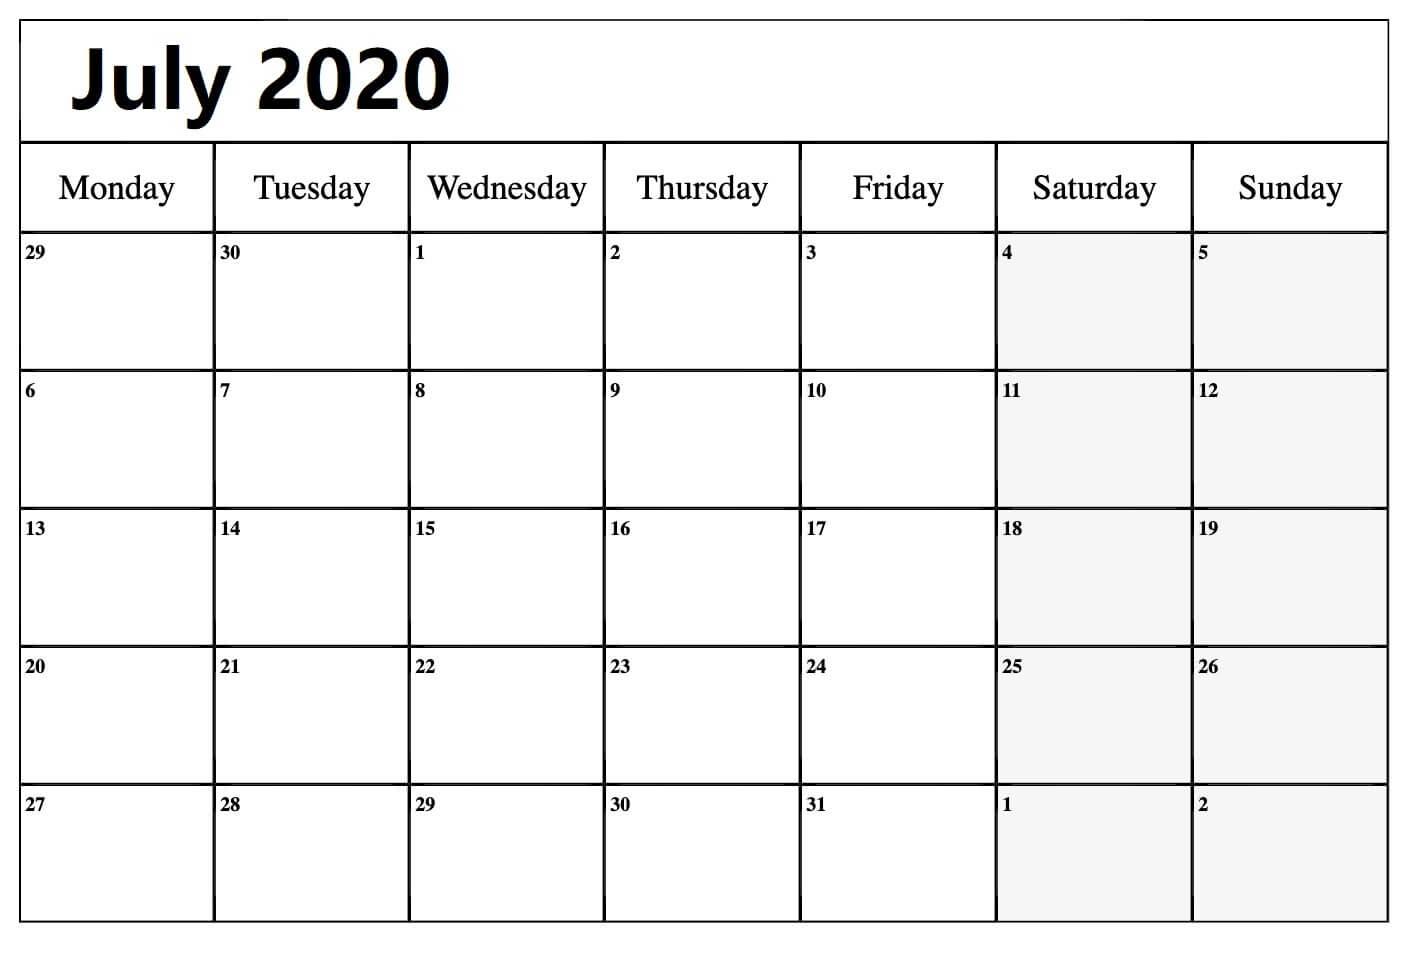 2020 July Monthly Calendar